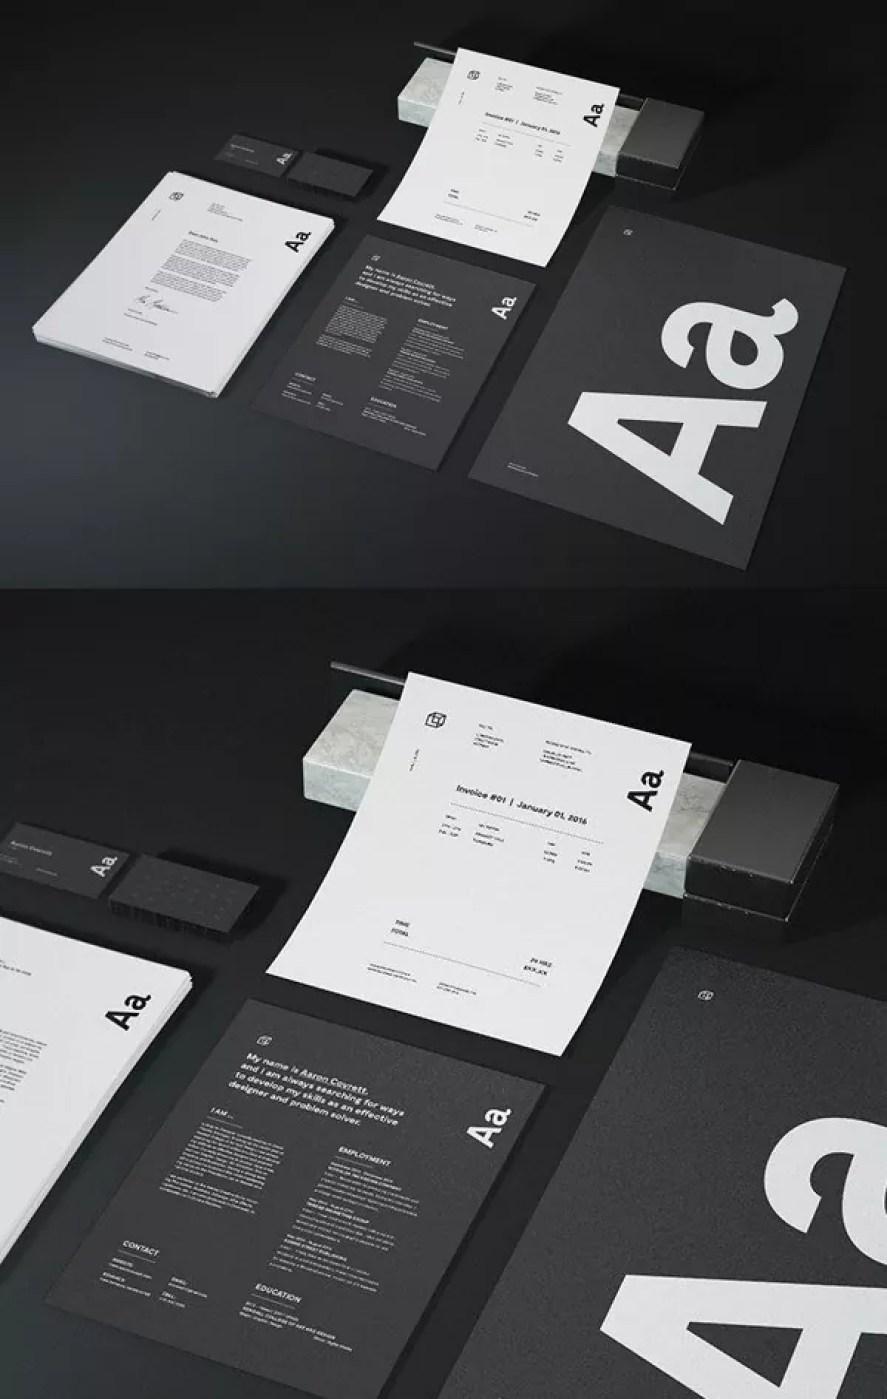 Free Identity Suite Mockup - 60+ Branding, Identity & Stationery Free PSD Mockups